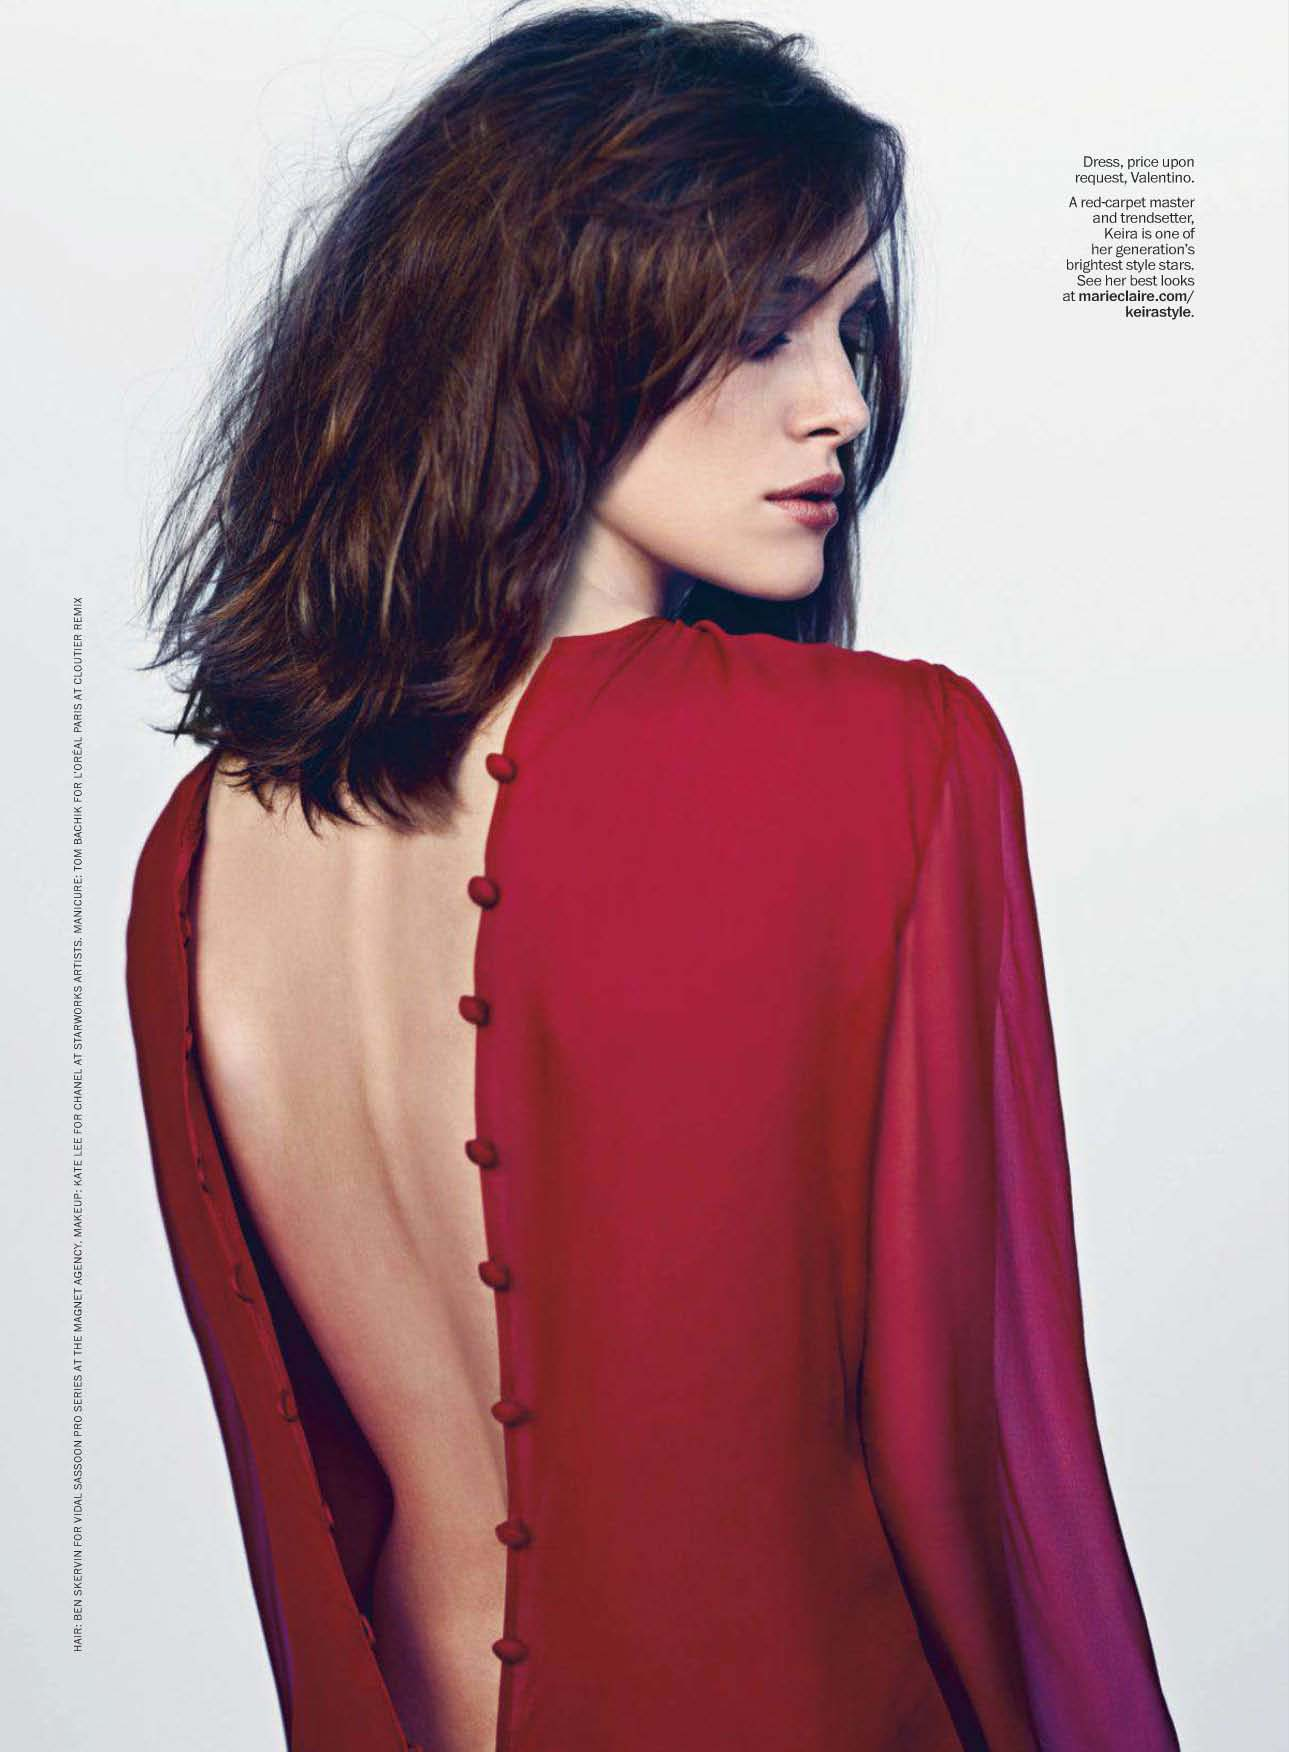 Keira Knightley 2013 : Keira Knightley – Marie Claire Magazine 2013-12